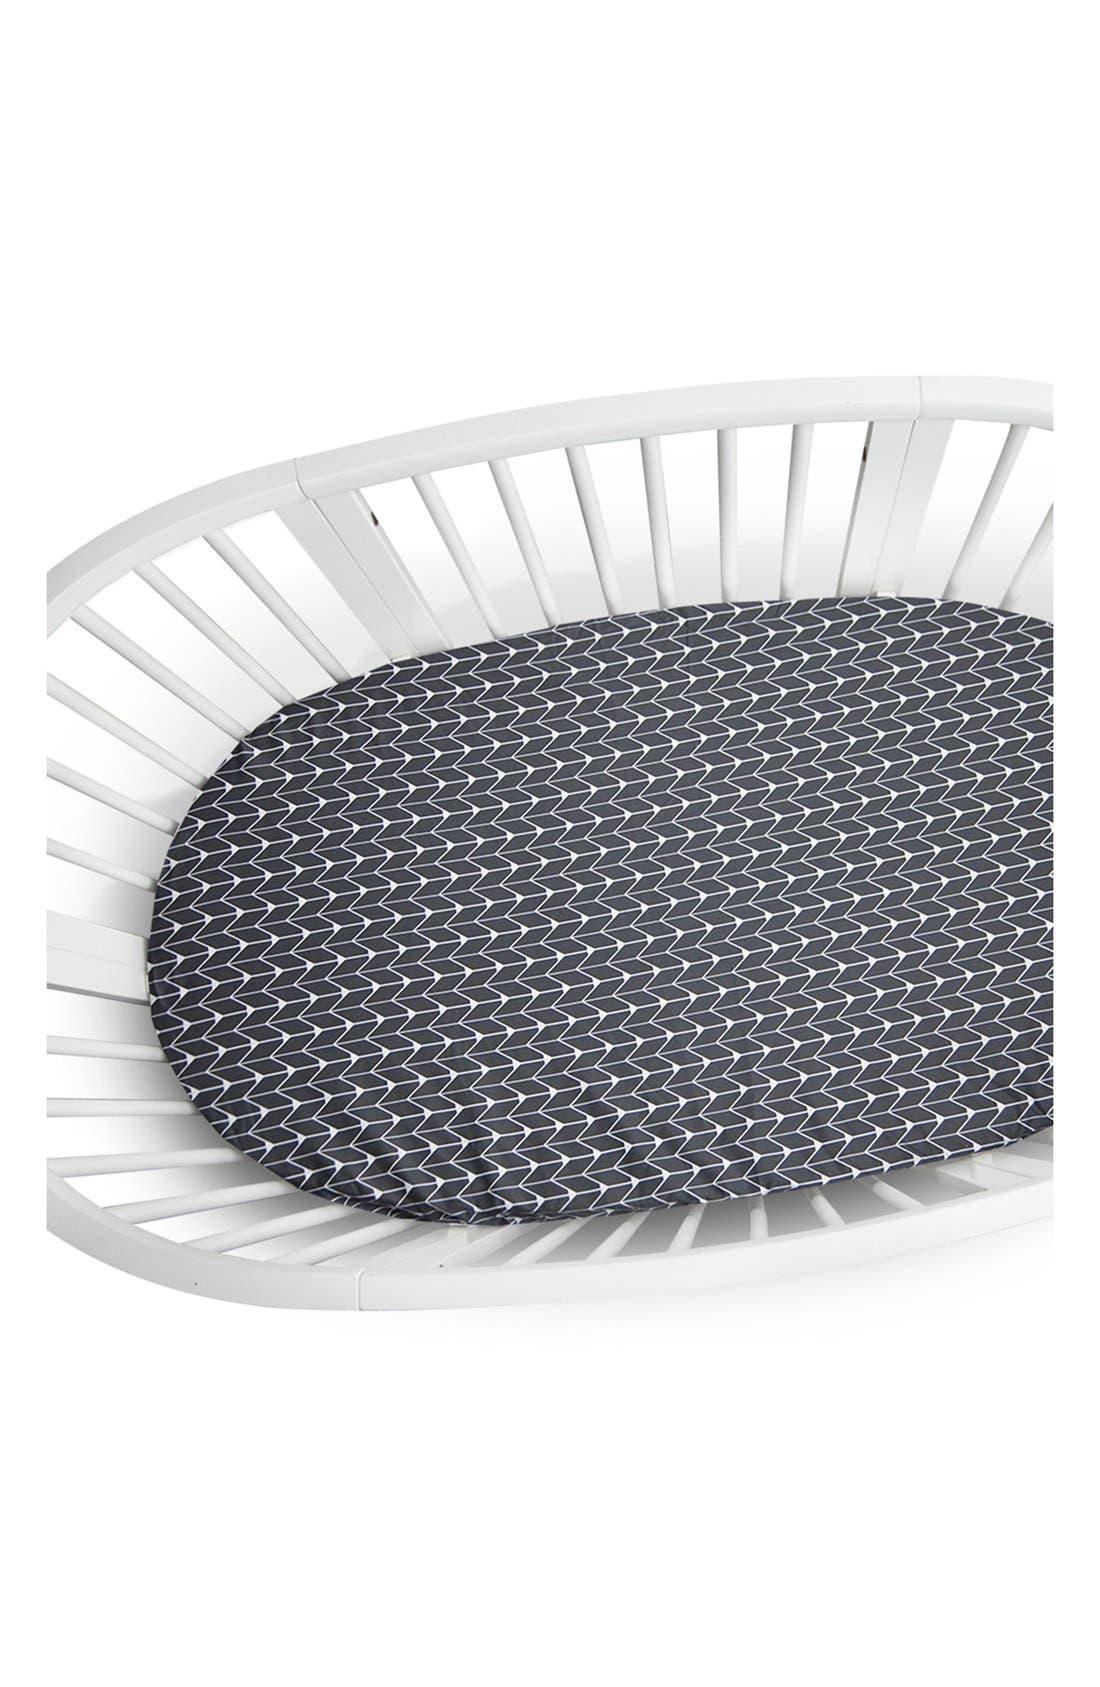 Alternate Image 1 Selected - Oilo 300 Thread Count Crib Sheet for Stokke Sleepi Crib